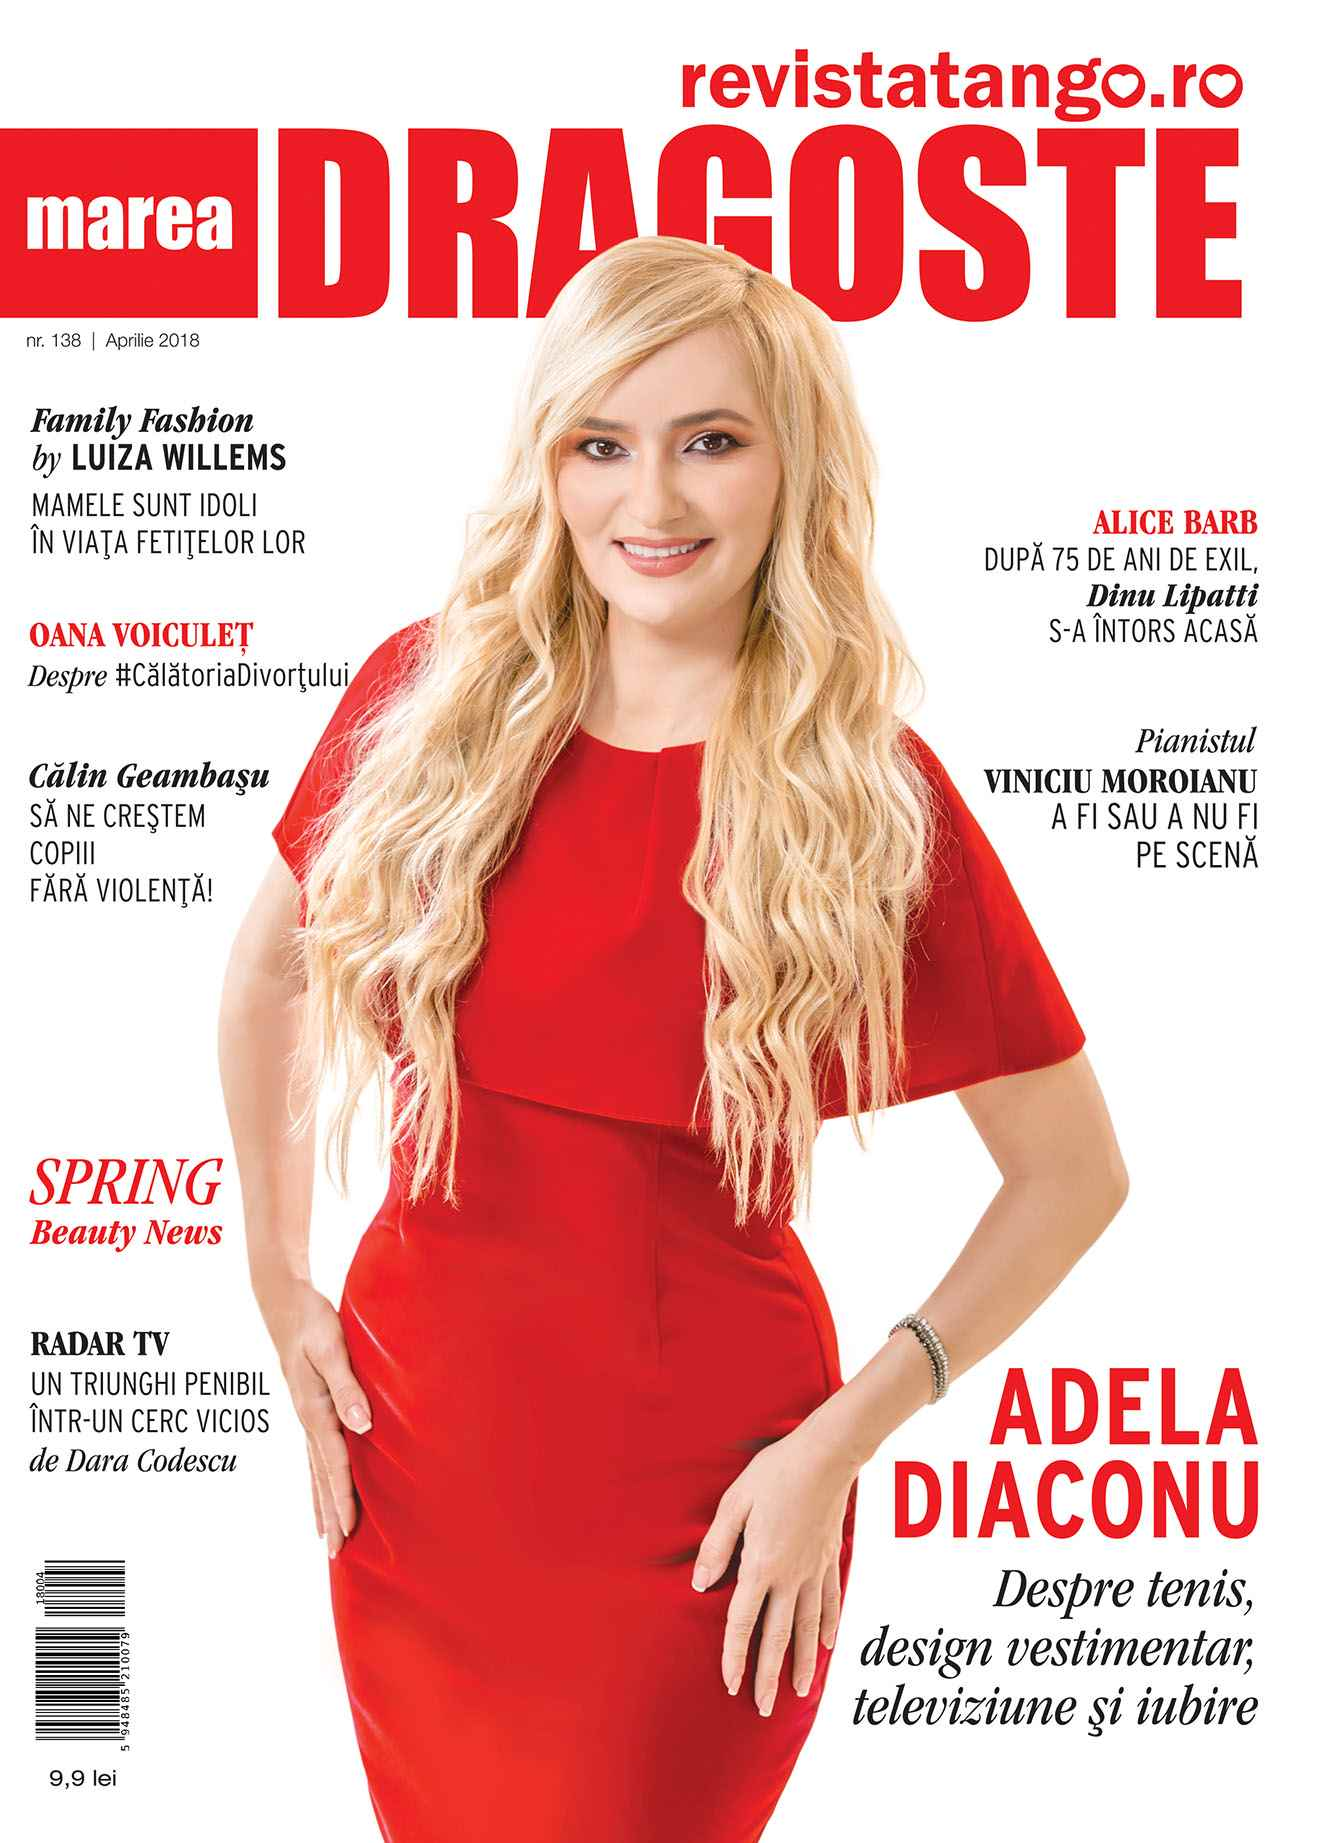 Adela Diaconu pe coperta Marea Dragoste-revistatango.ro, nr. 138, aprilie 2018